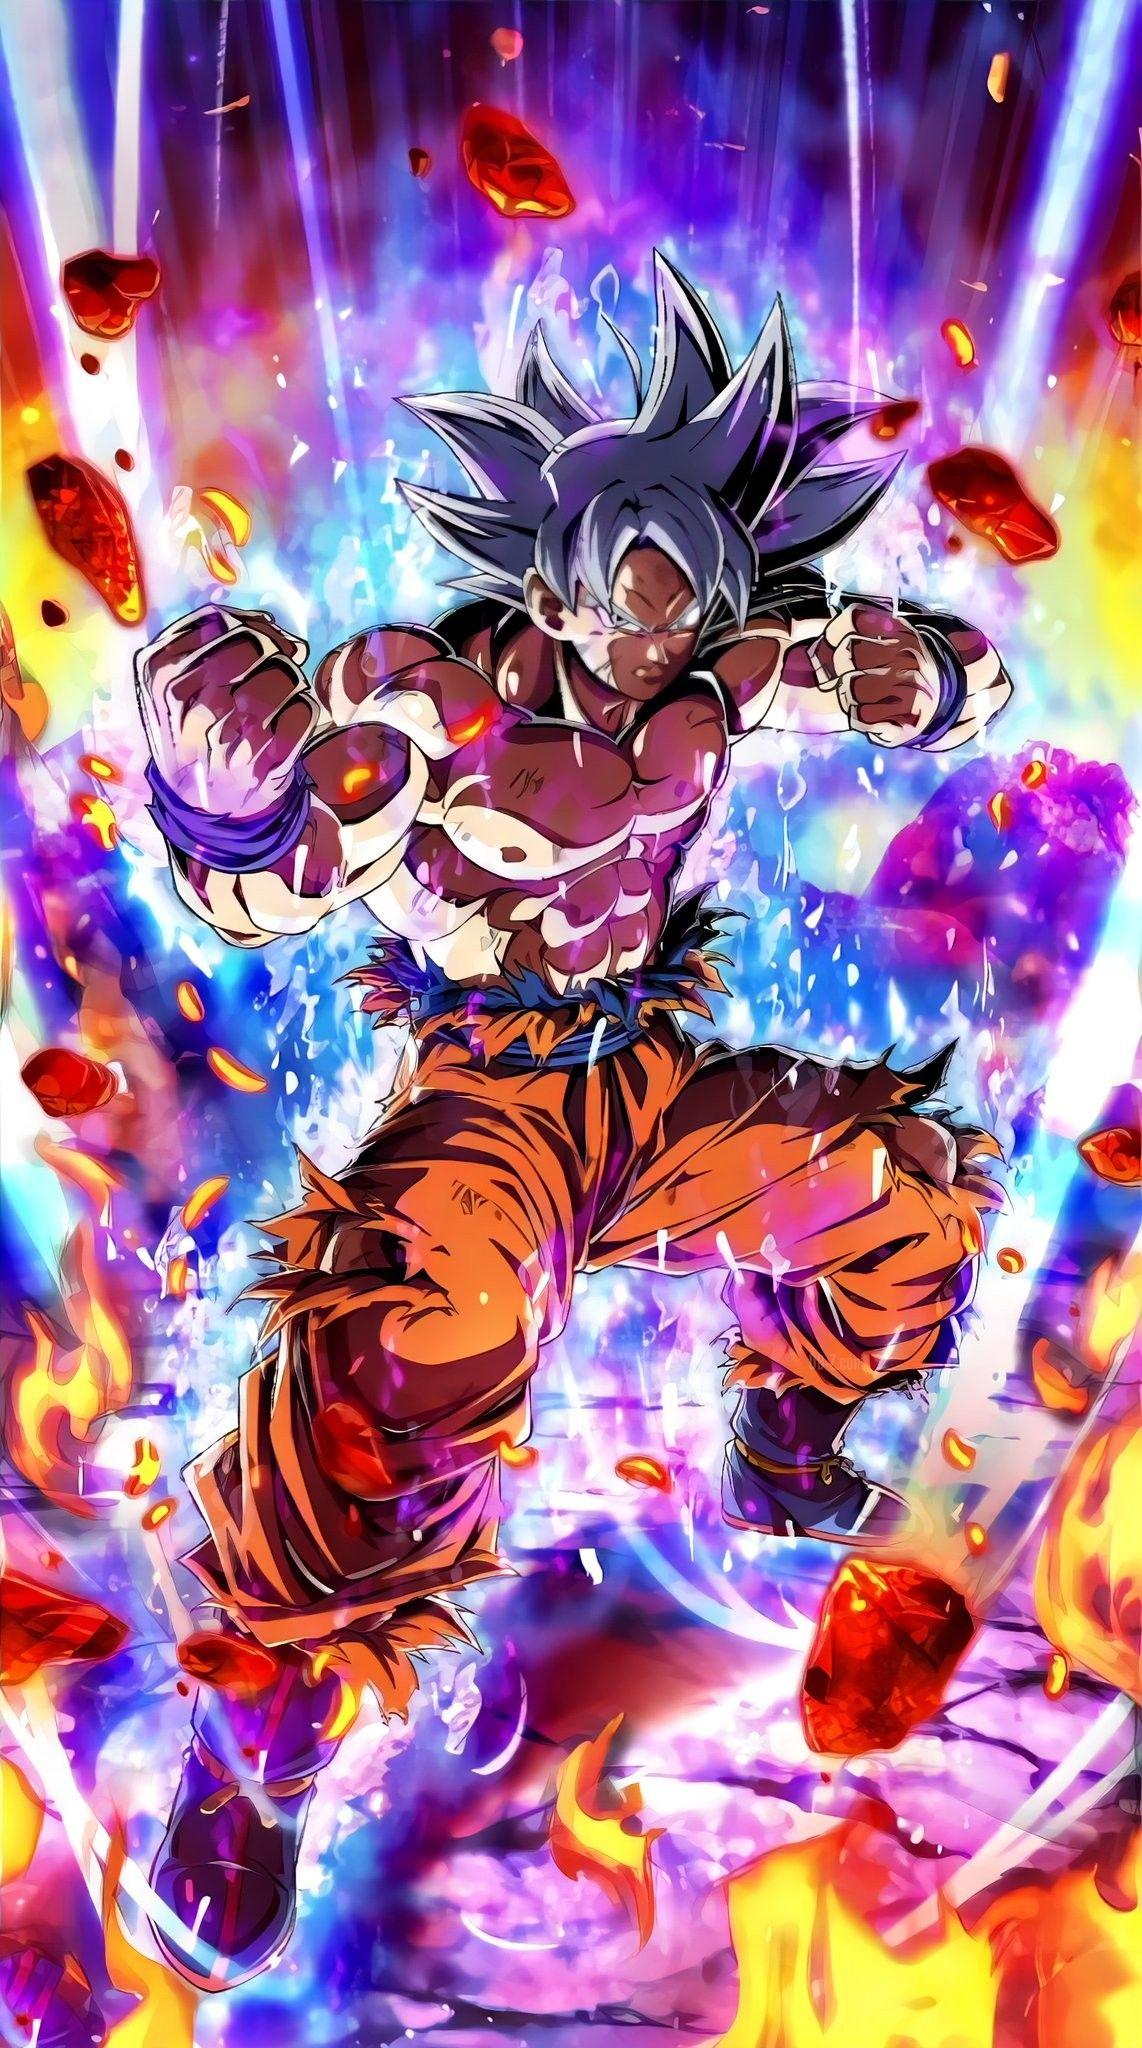 Lr Goku Ultra Instinct Mastered In 2021 Dragon Ball Super Artwork Anime Dragon Ball Super Dragon Ball Tattoo